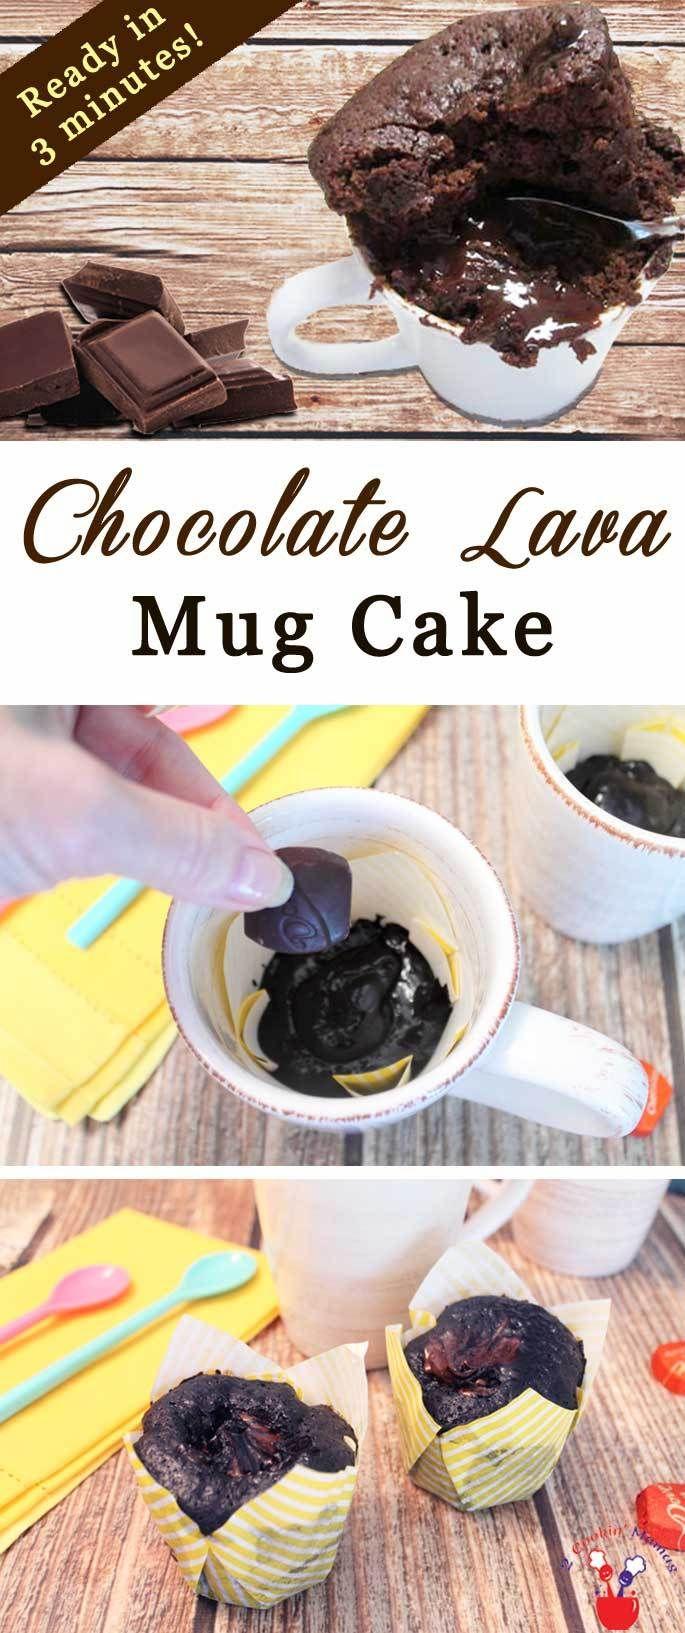 Chocolate Lava Mug Cake pin | 2 Cookin Mamas Chocolaty, dense & delicious mug cake that takes only minutes to bake.